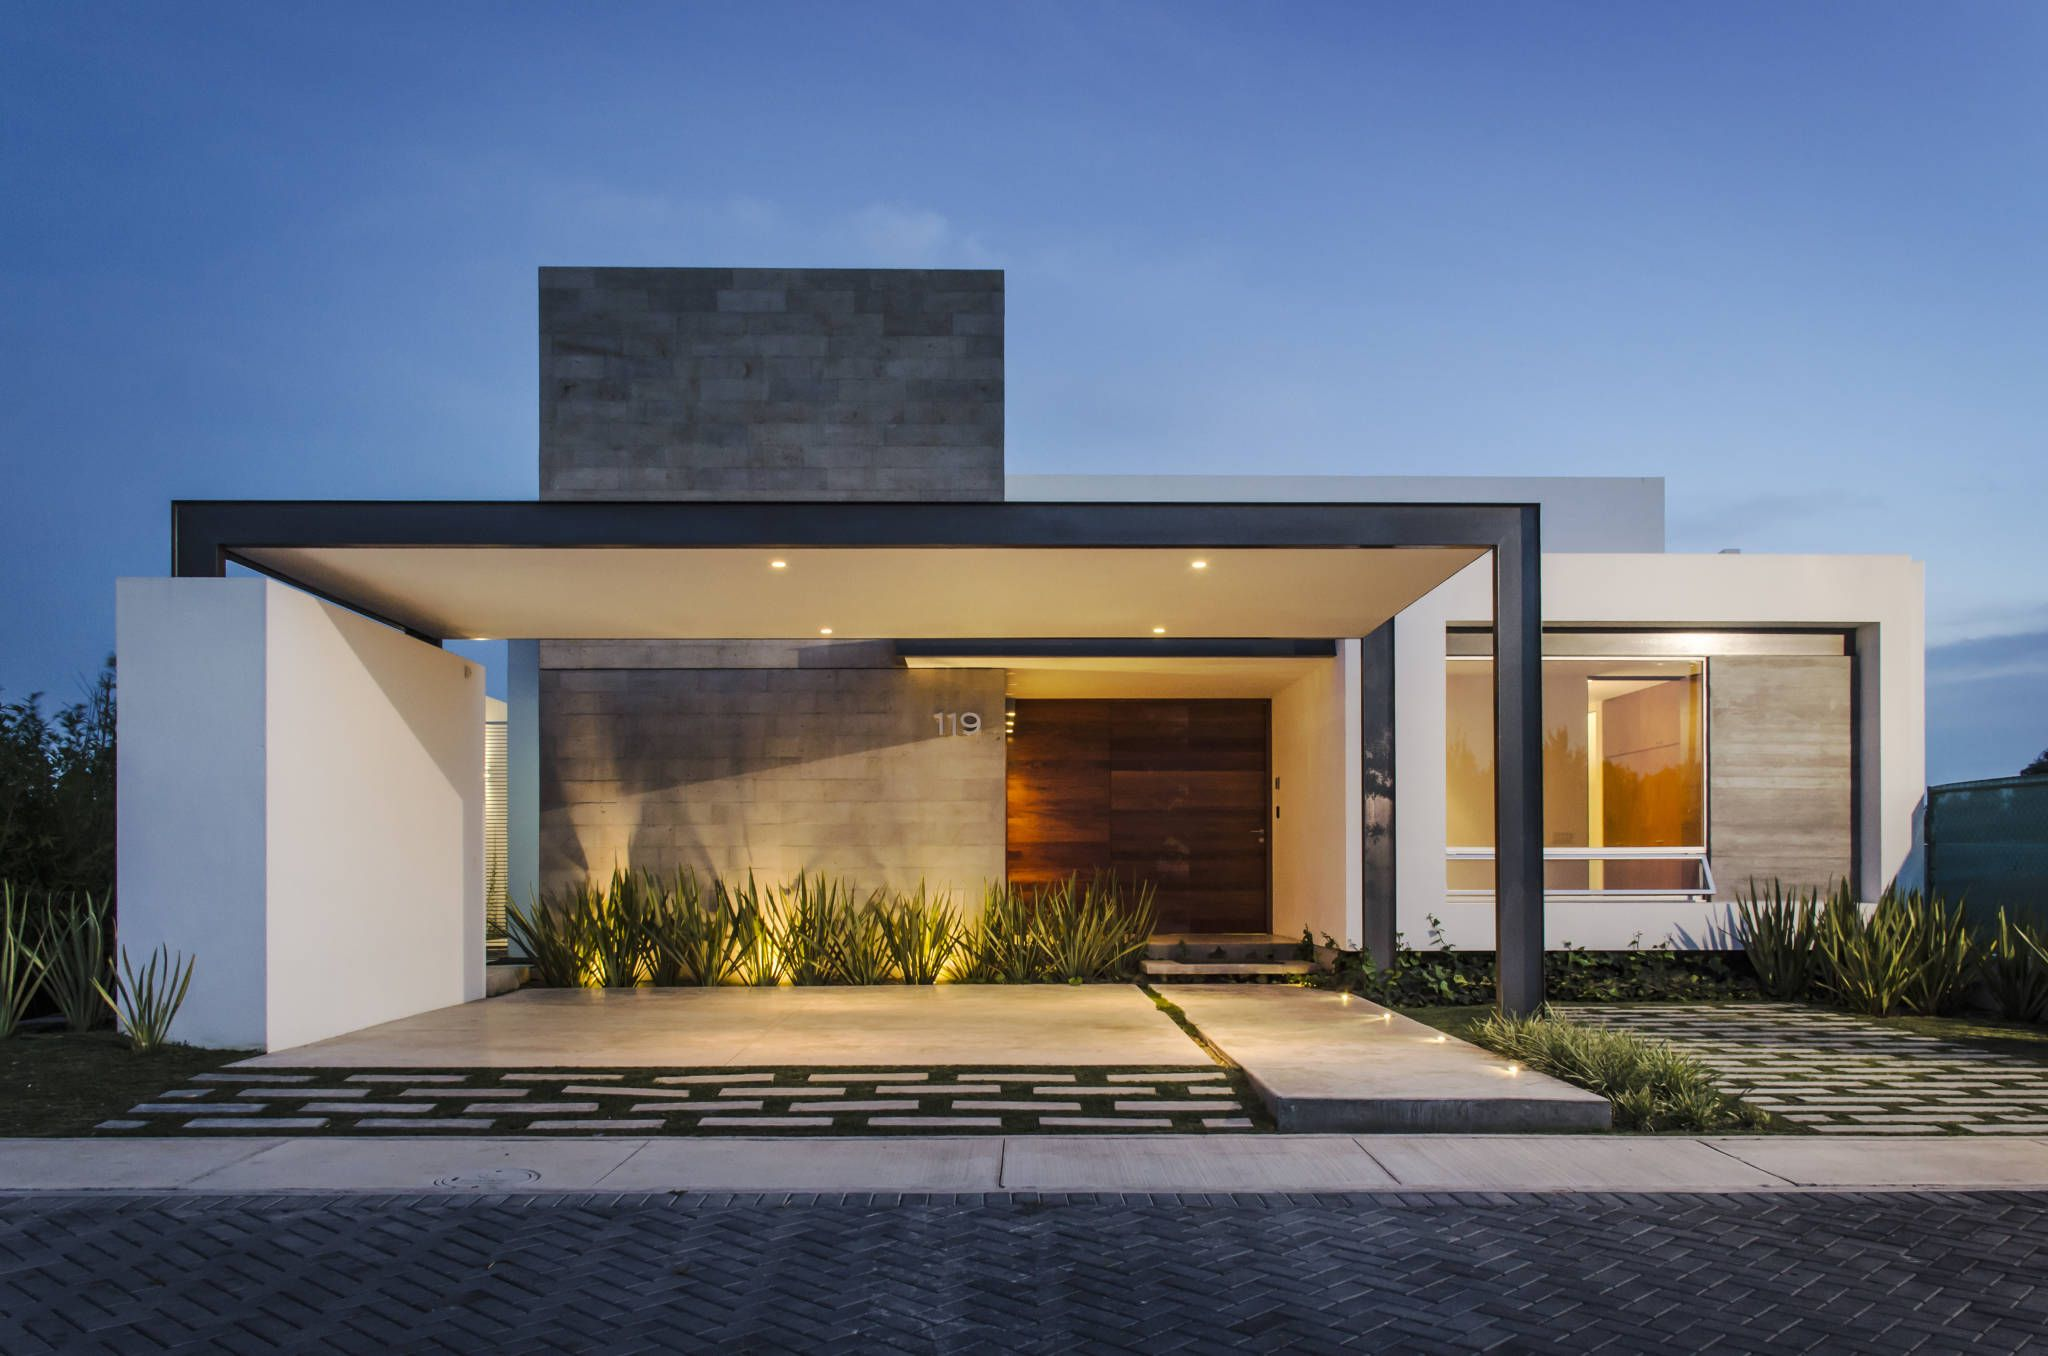 Case in stile di architettura moderna design case for Architettura moderna case